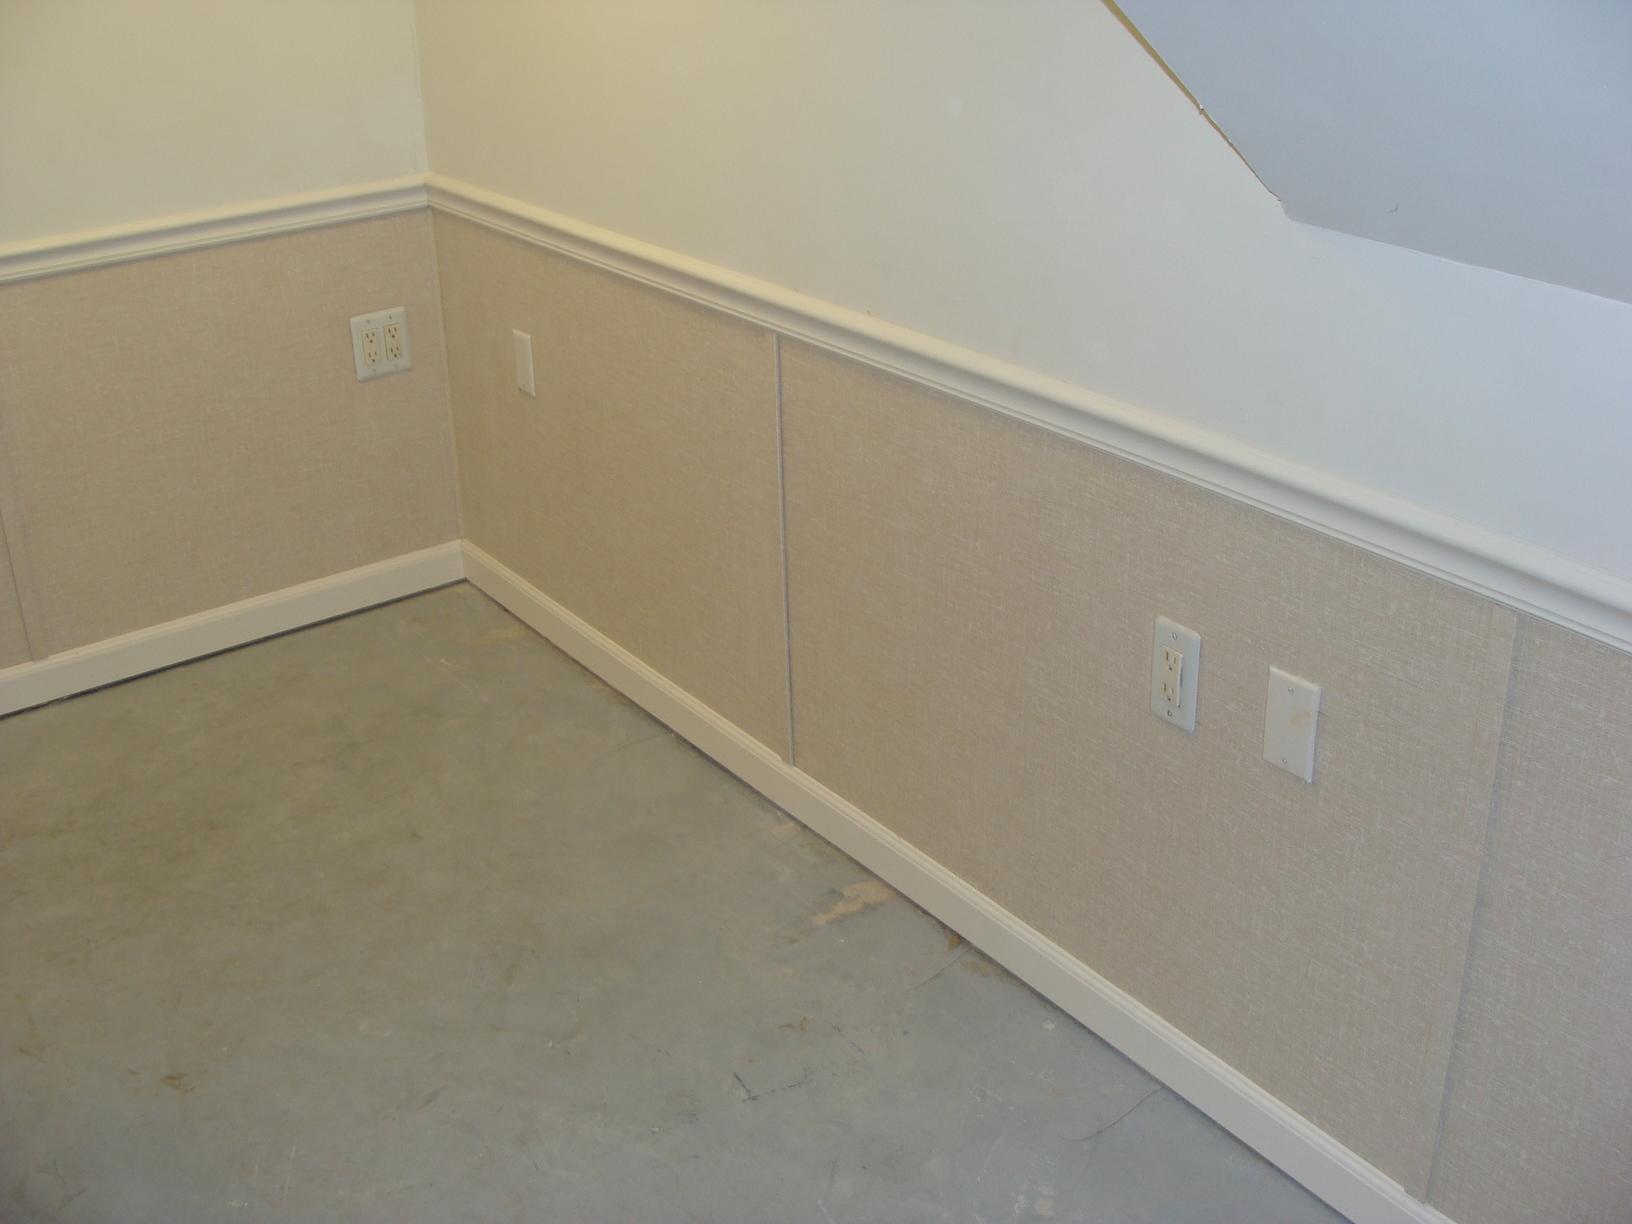 Basement Wall Restoration - After Photo